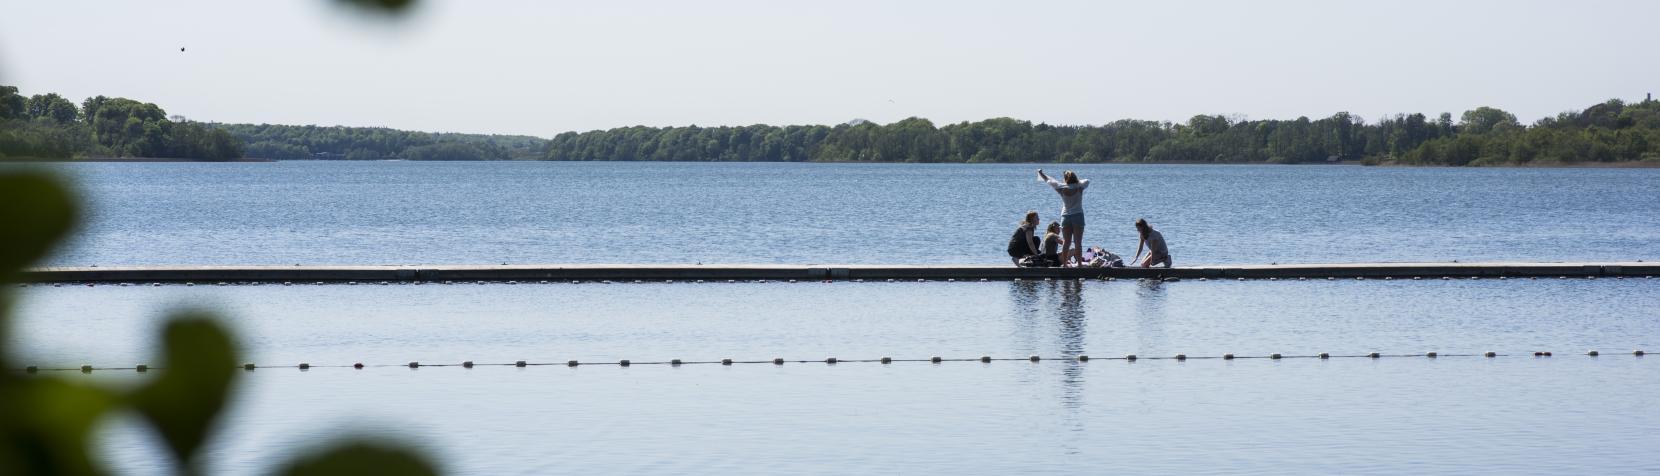 View of lake and Danish nature